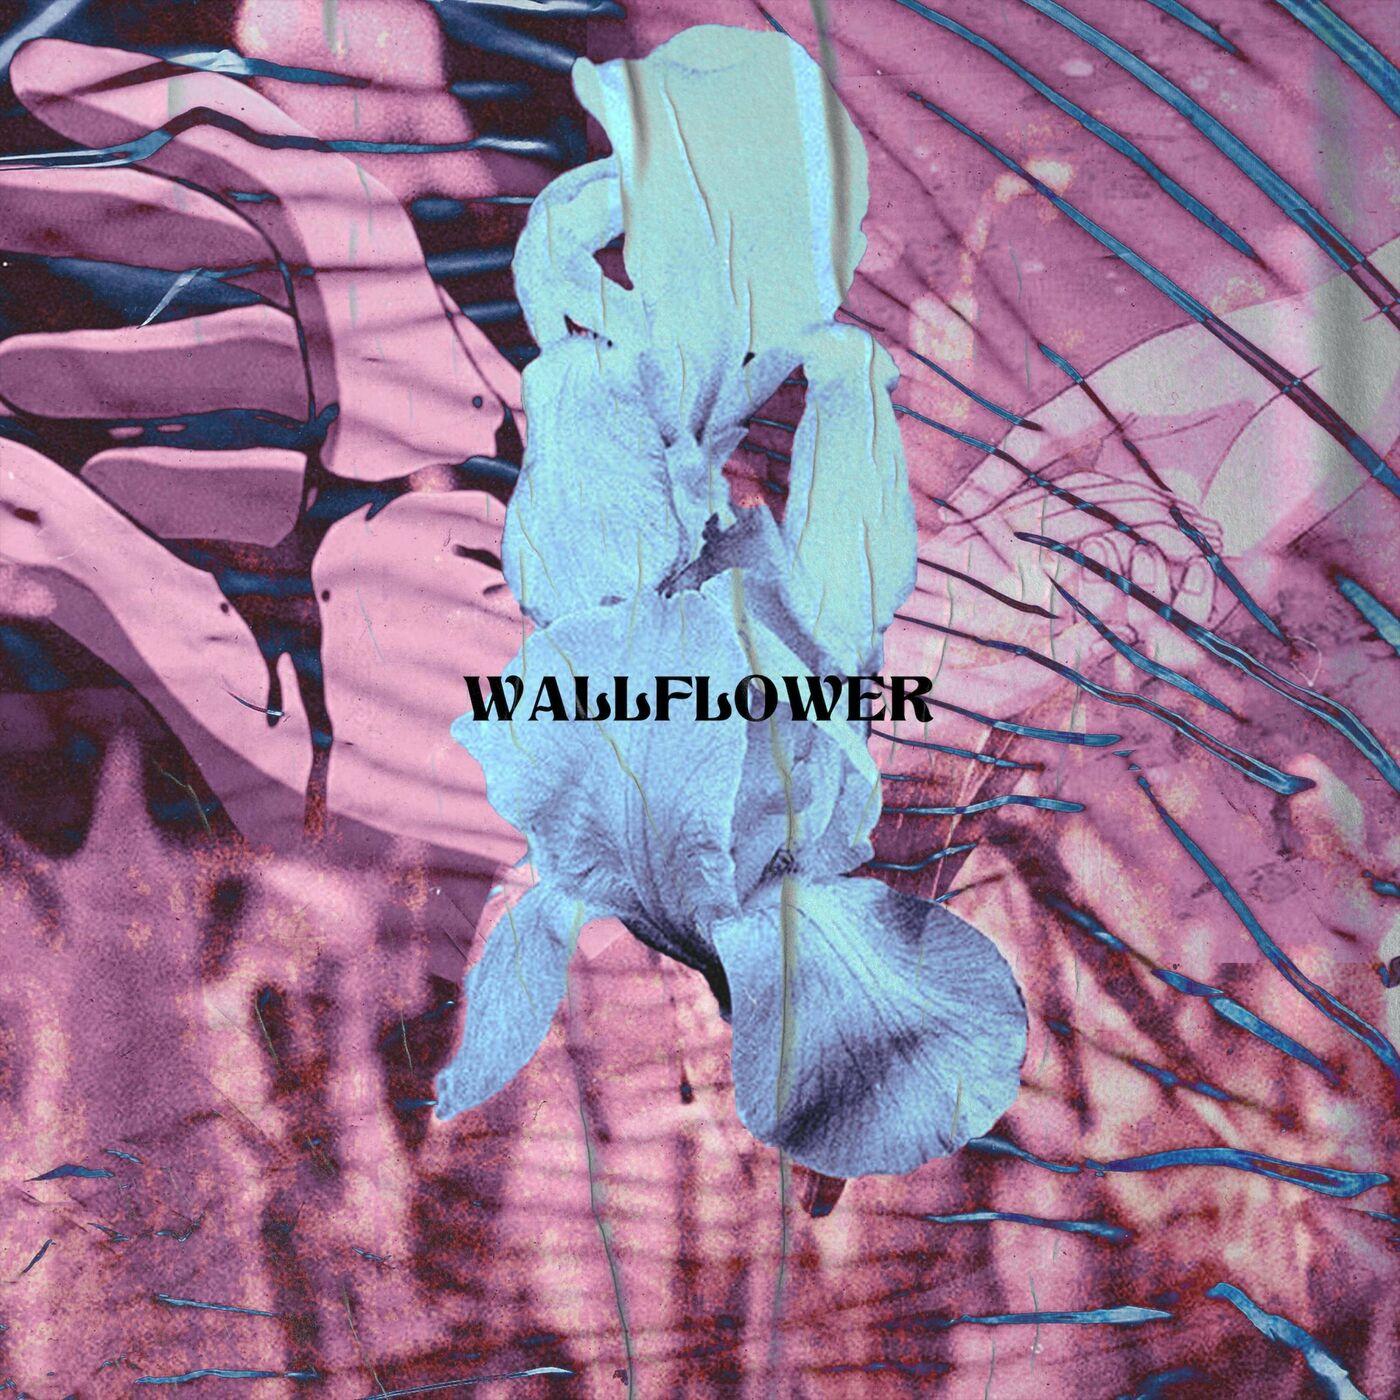 Visceral Autopsy - Wallflower [EP] (2020)